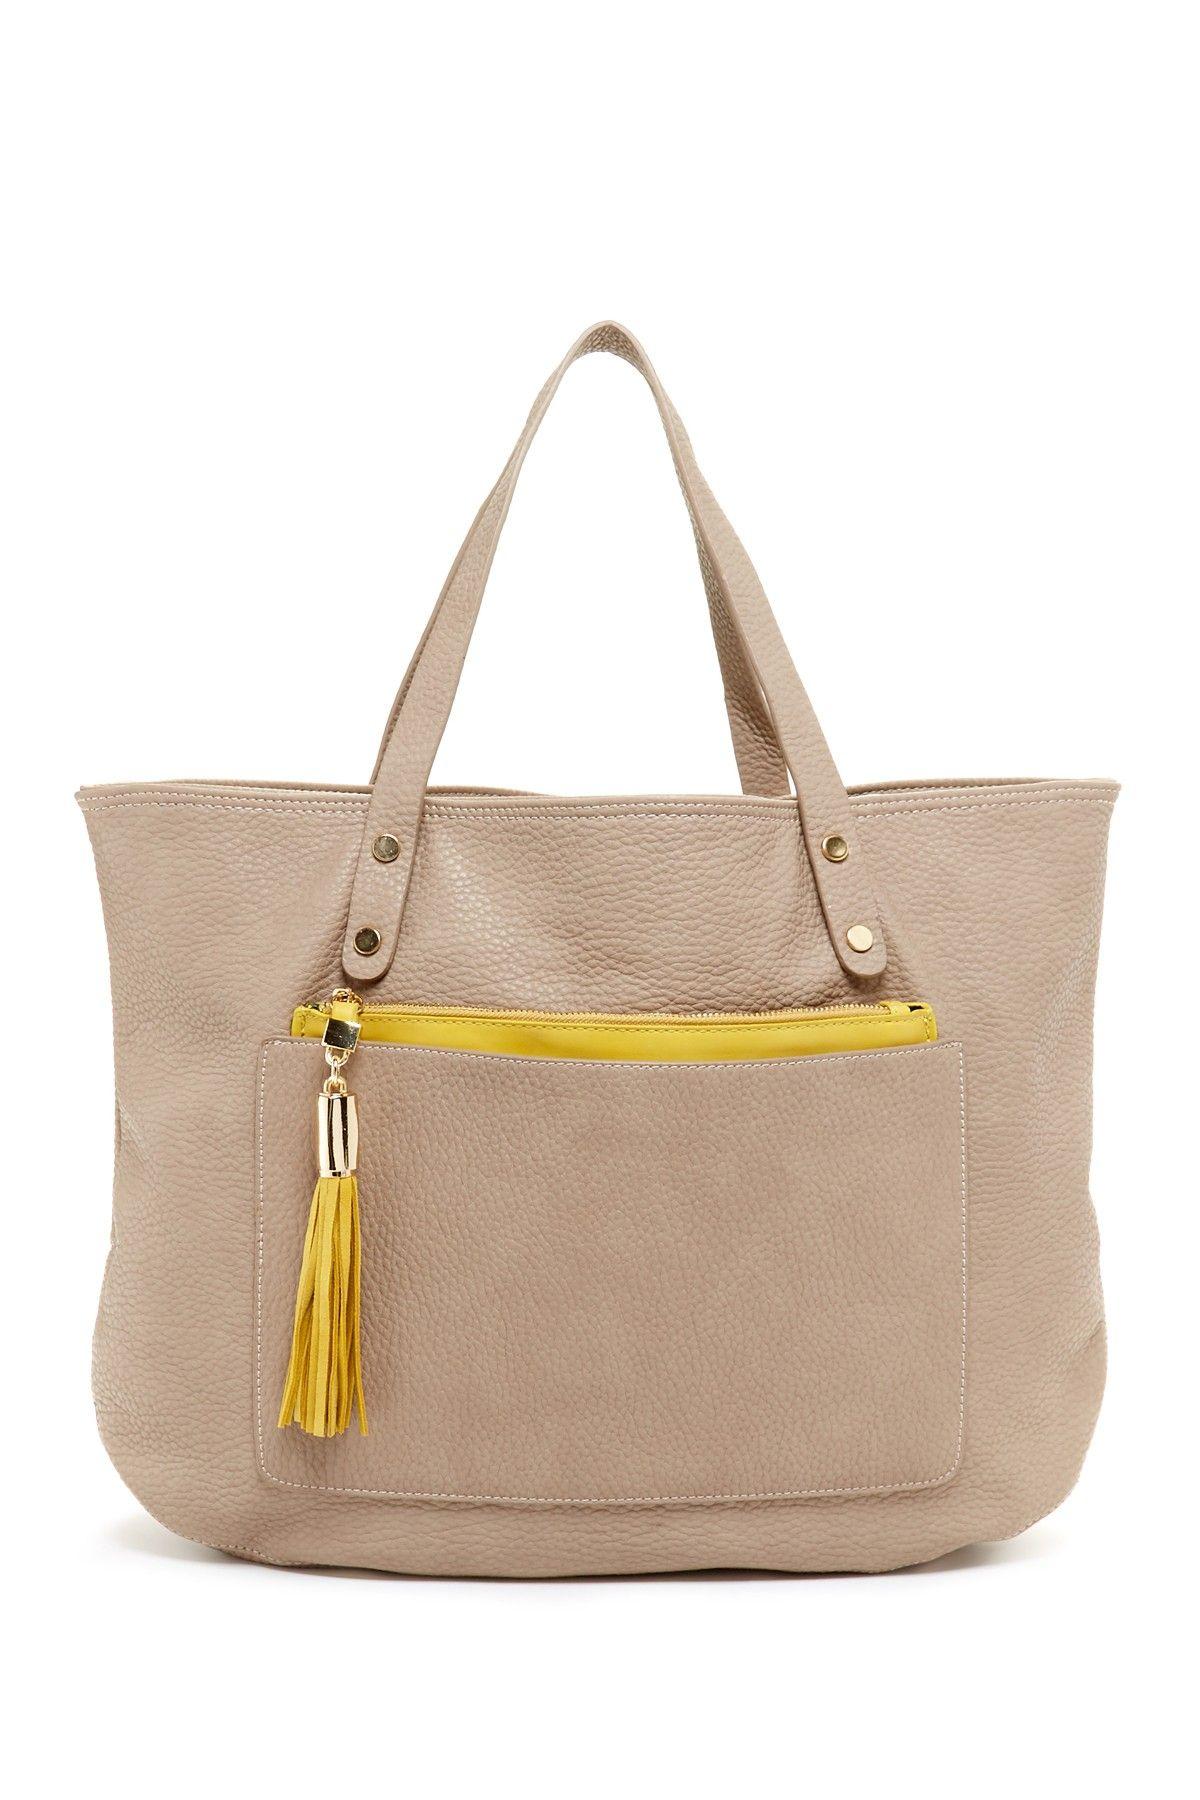 8f53bc75b6 ... Best designer summer handbags on sale at Nordstrom Zac Posen crossbody  bag  save off 95c14 6a315 Ryan Tote Nordstrom